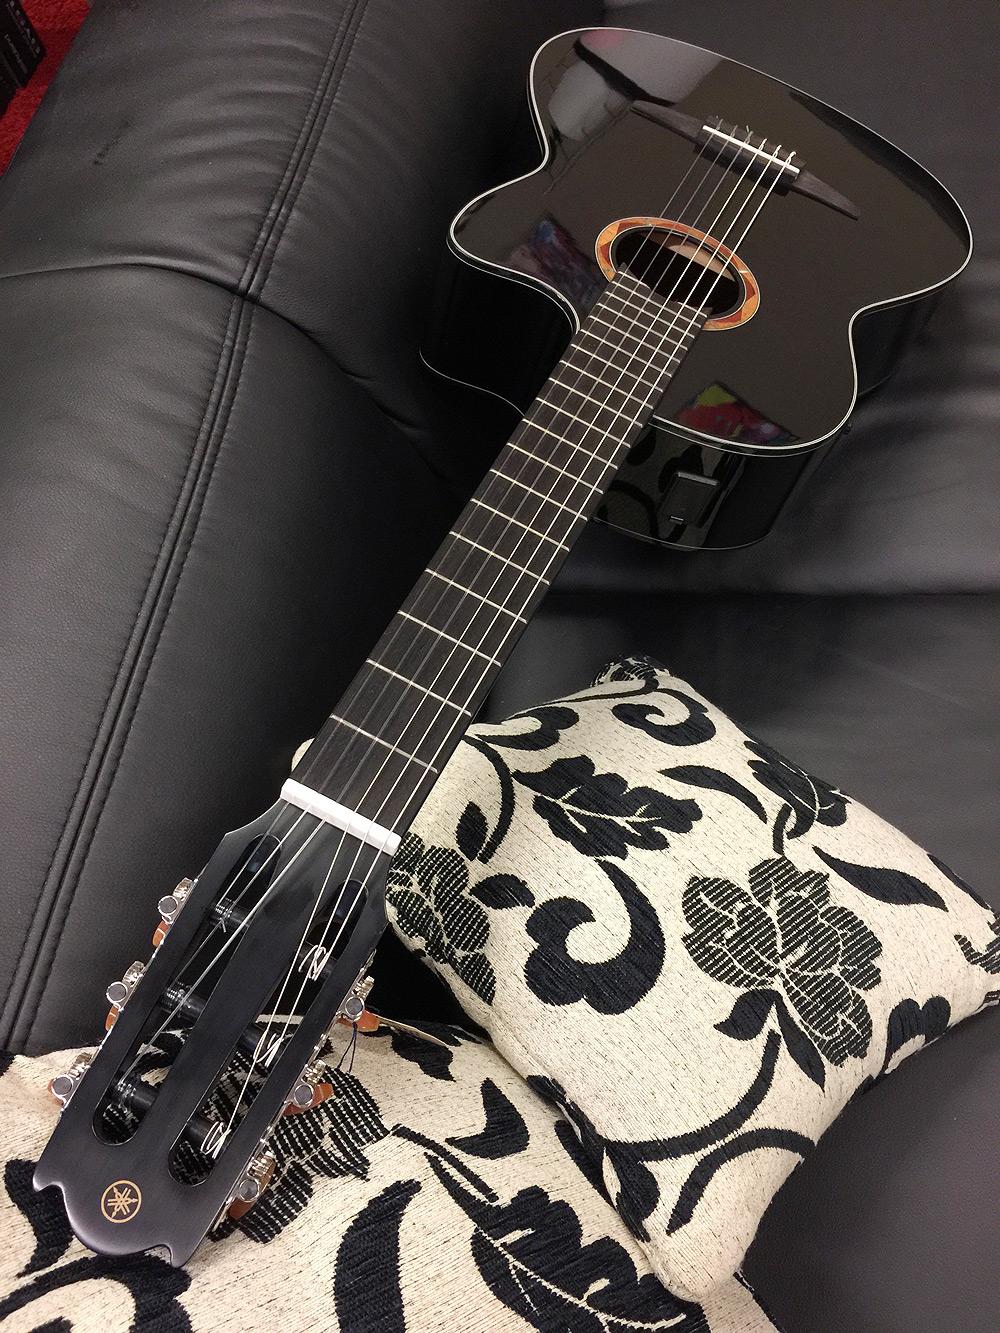 yamaha ncx700 bl nylon elektro akustik gitarre schwarz. Black Bedroom Furniture Sets. Home Design Ideas